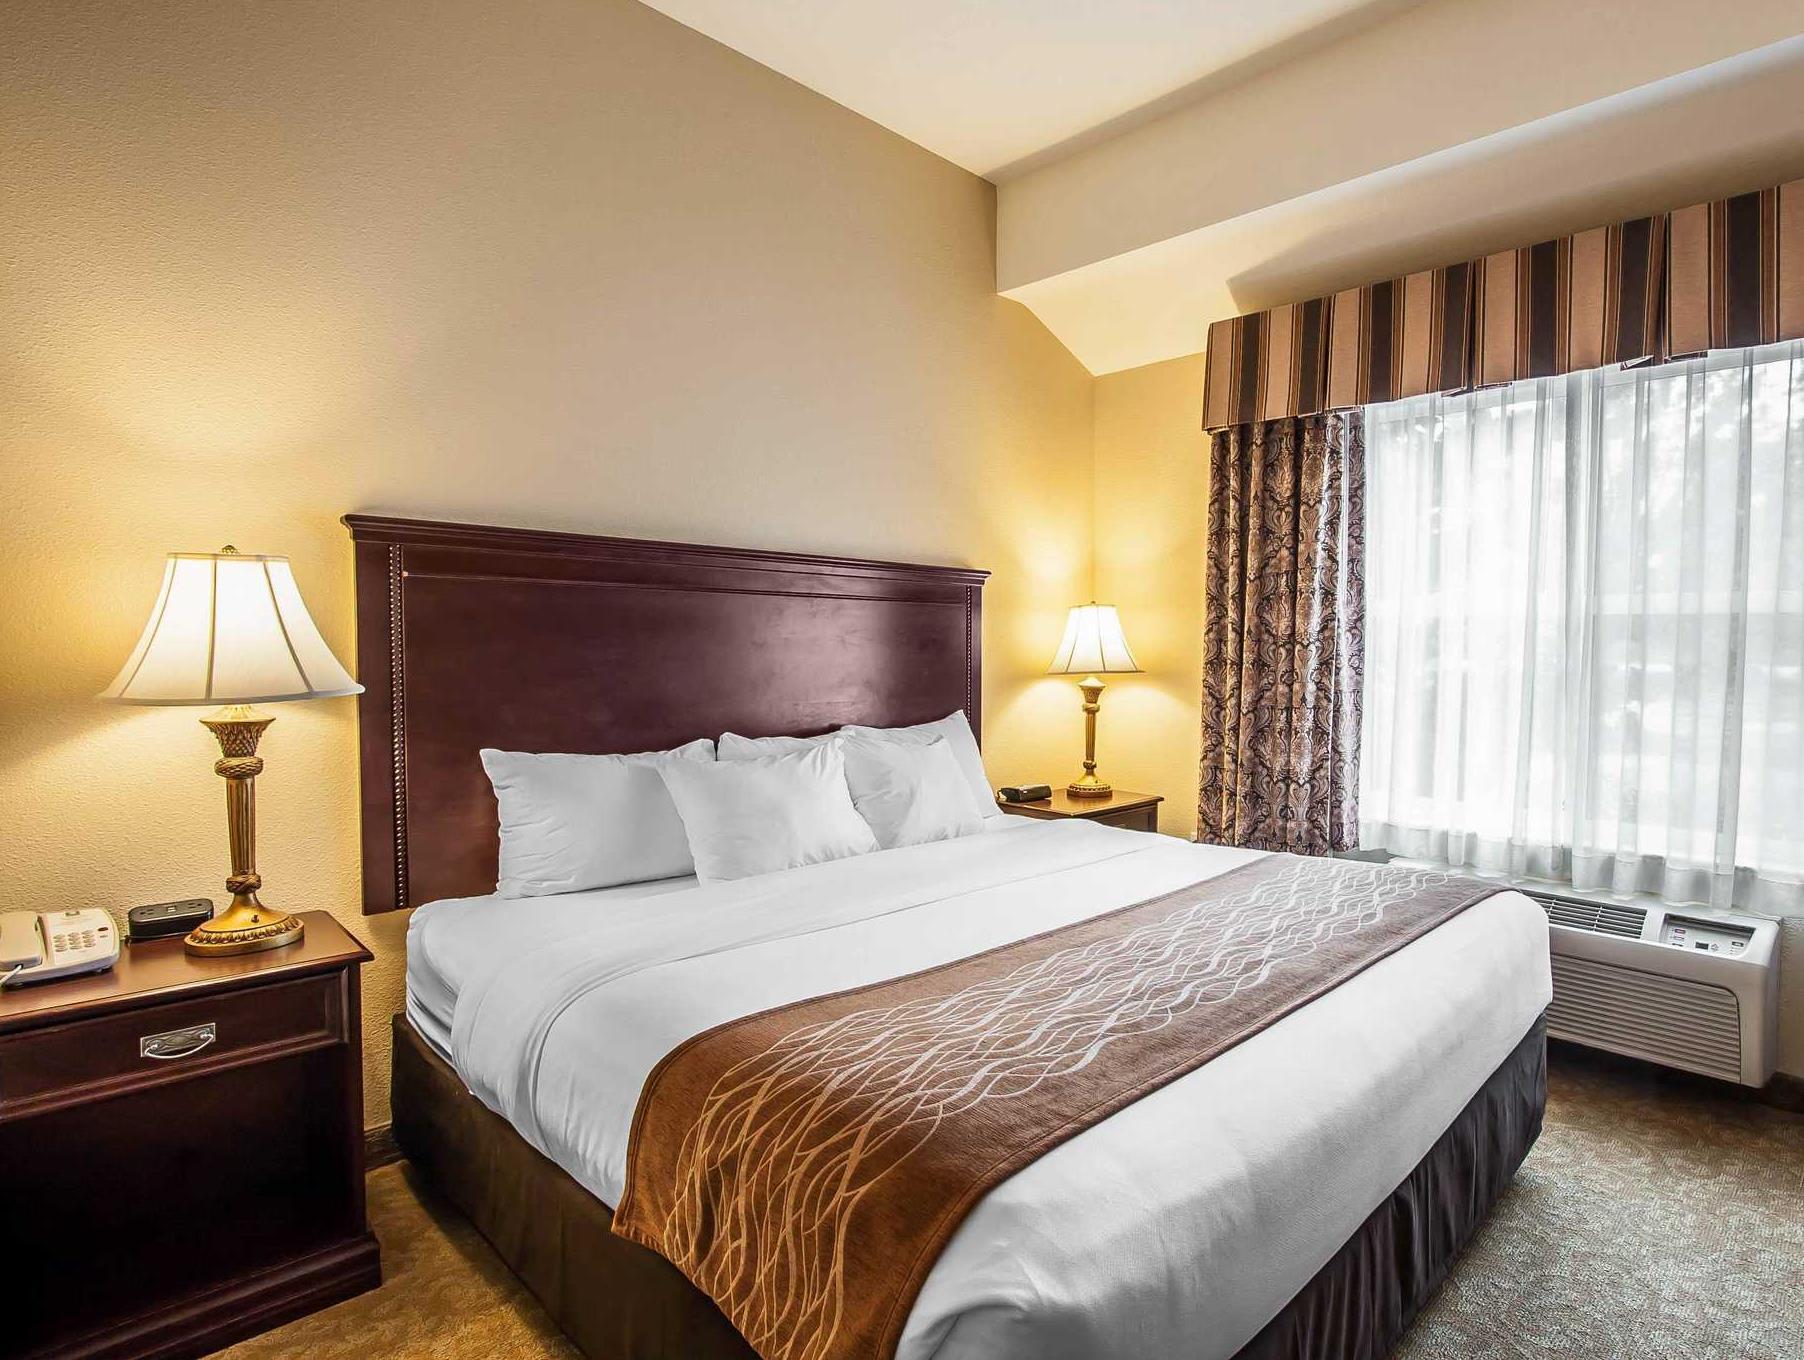 hotel image orbitz inn salem reviews hotels in on featured information rates mcminnville comforter vineyard z comfort